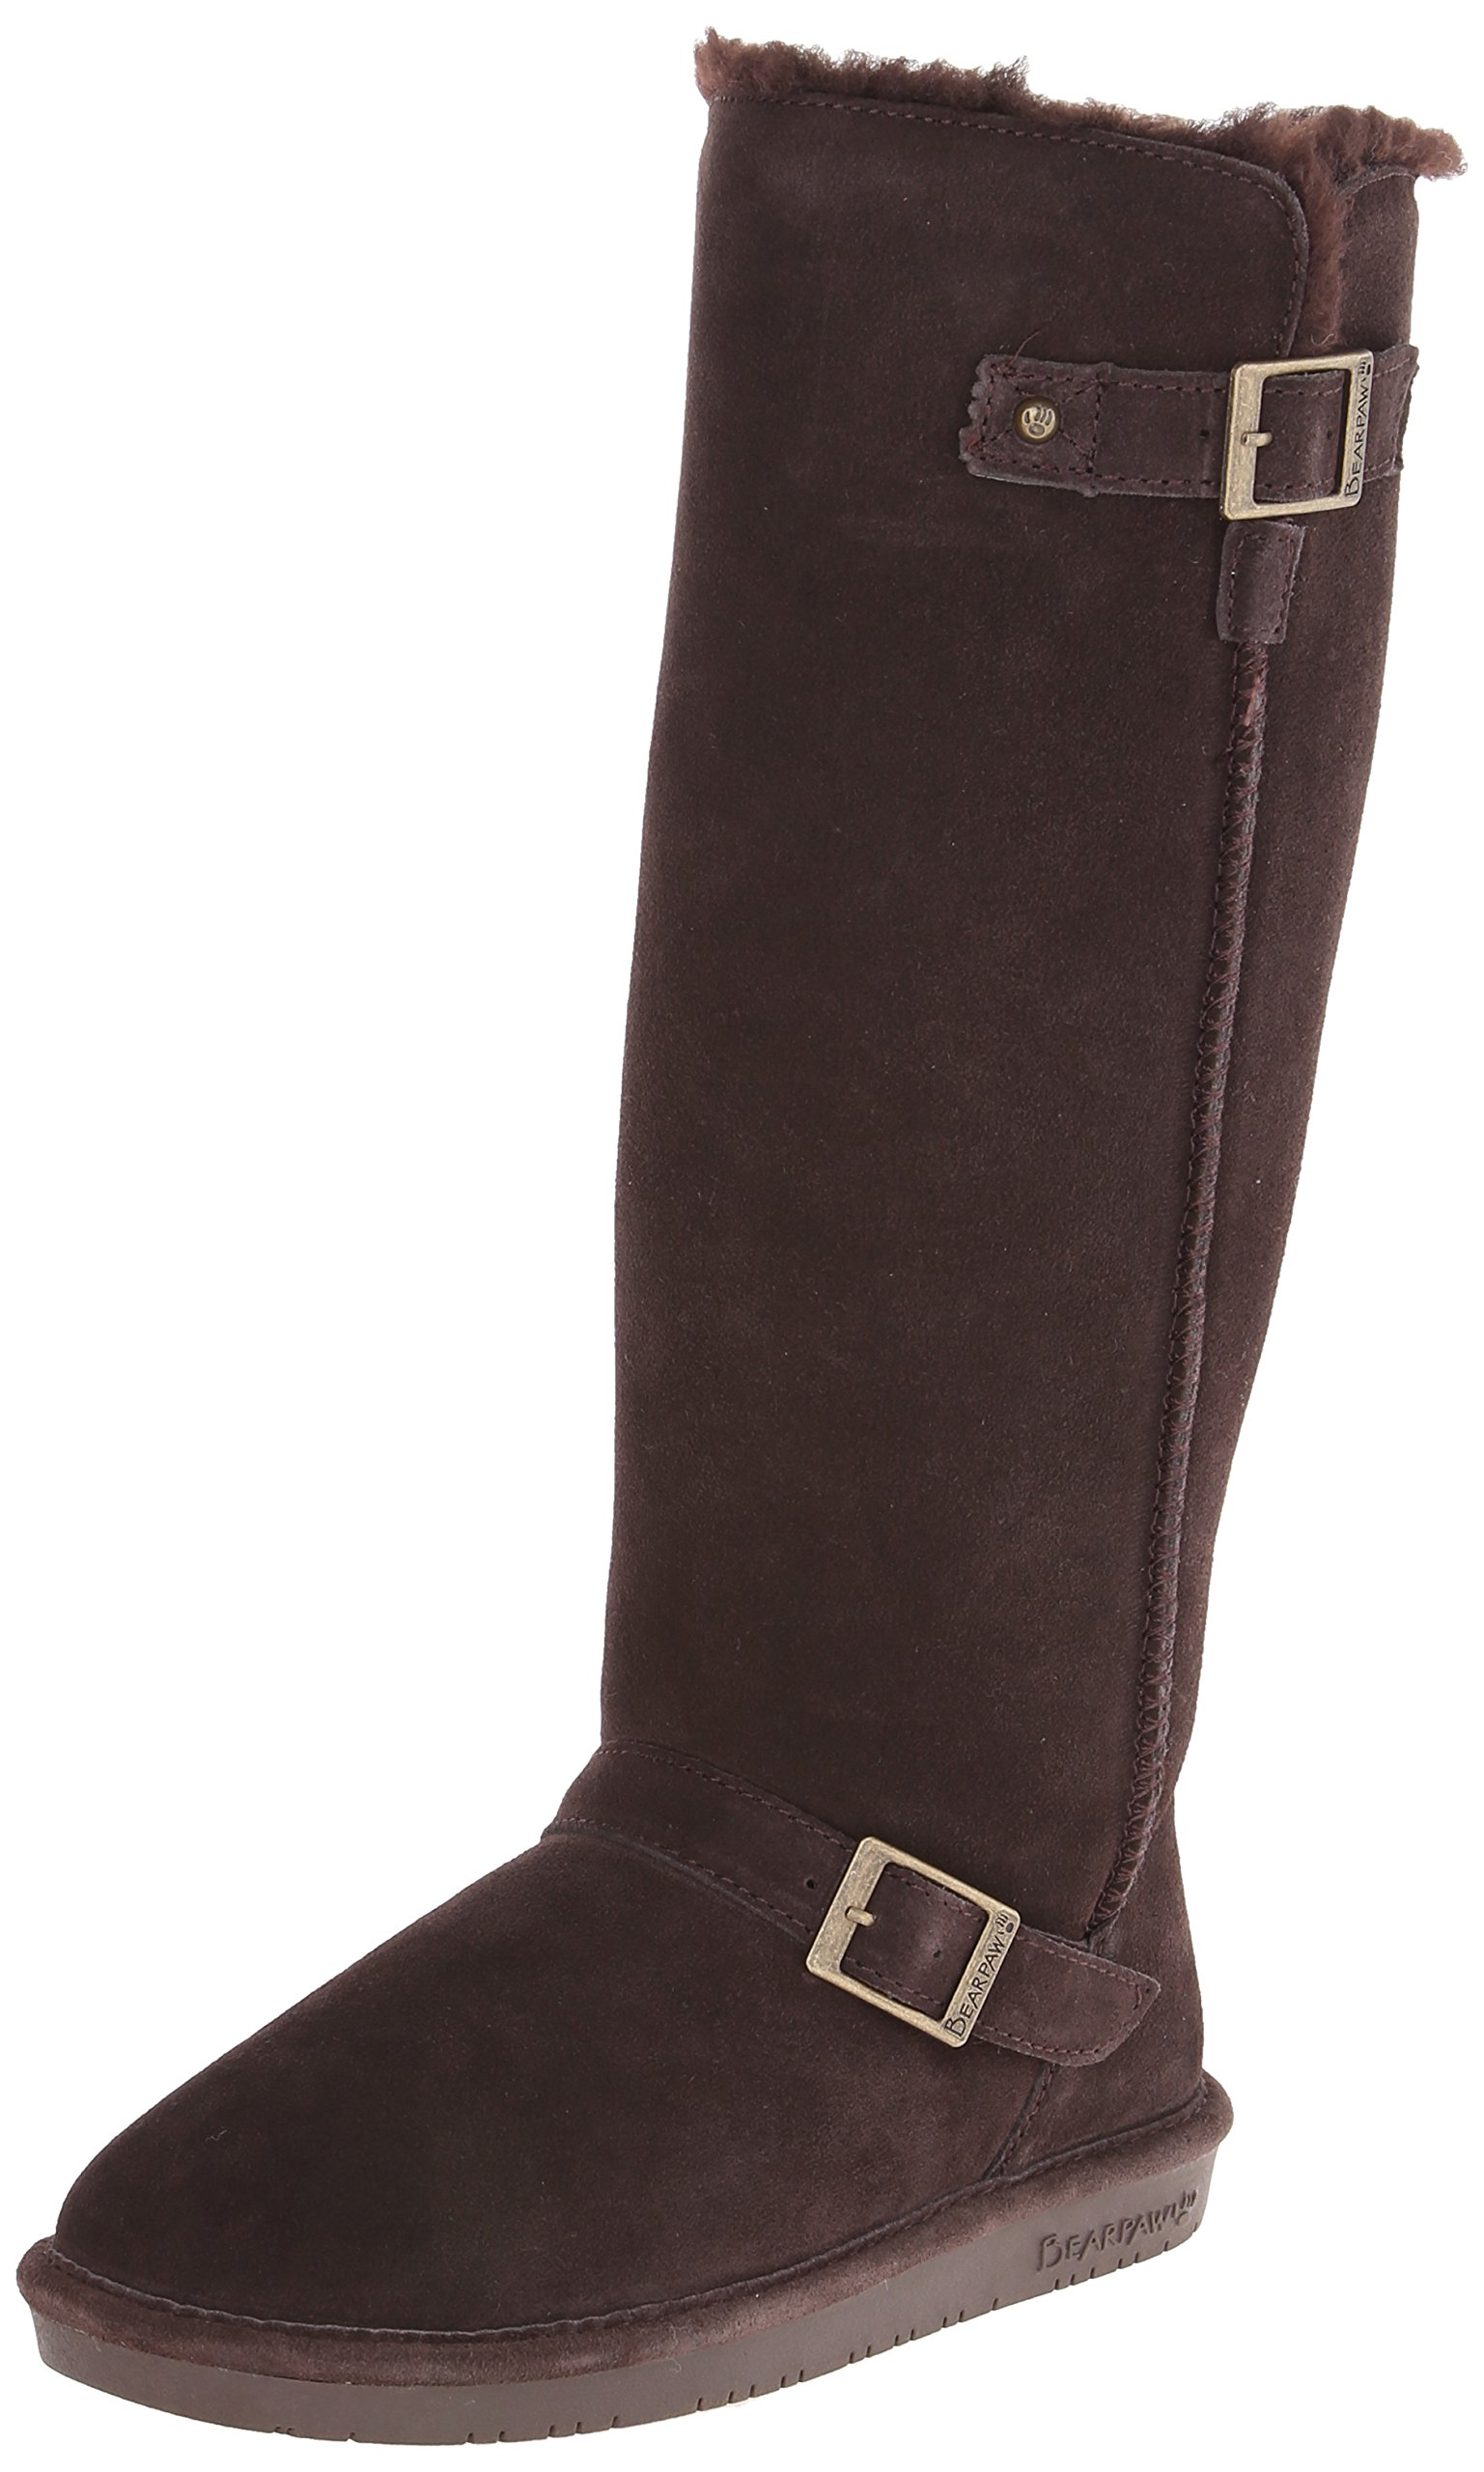 Bearpaw Womens Johanna Boot Chocolate Size 10